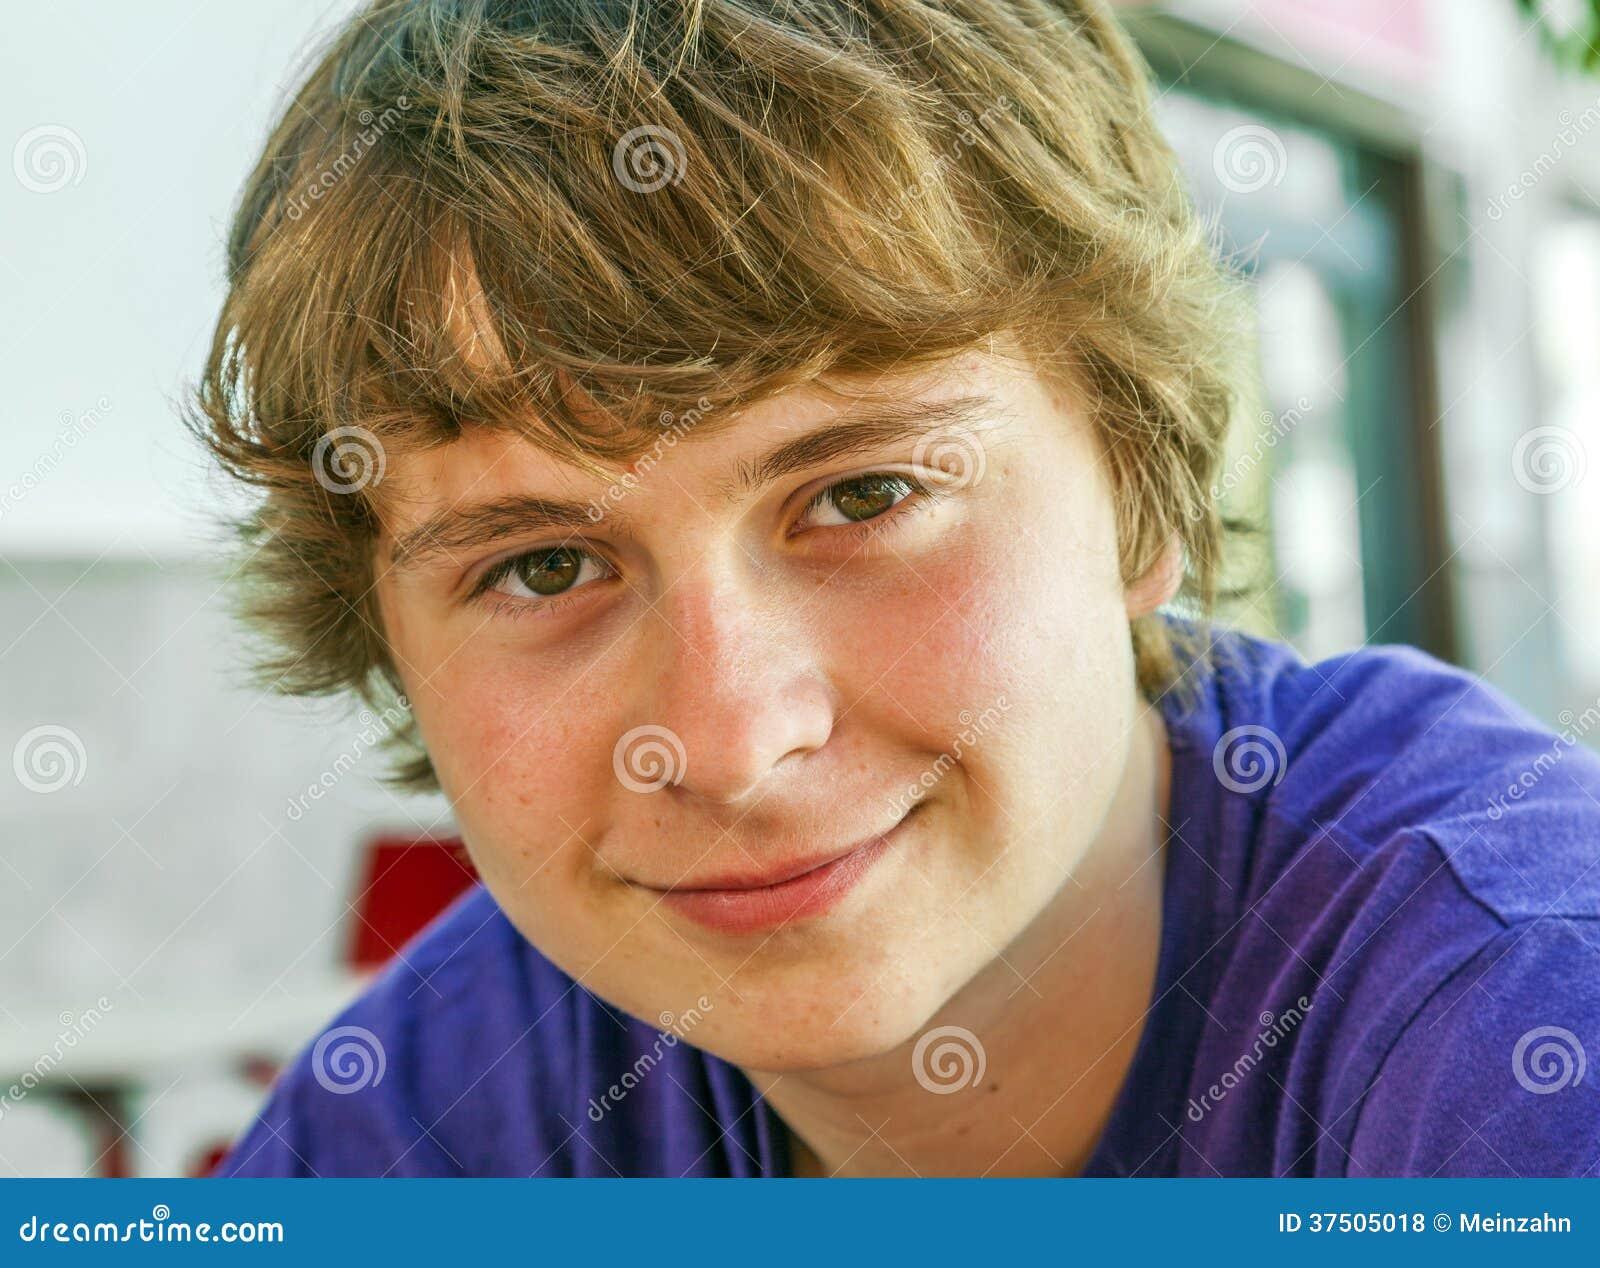 boy Blonde teen